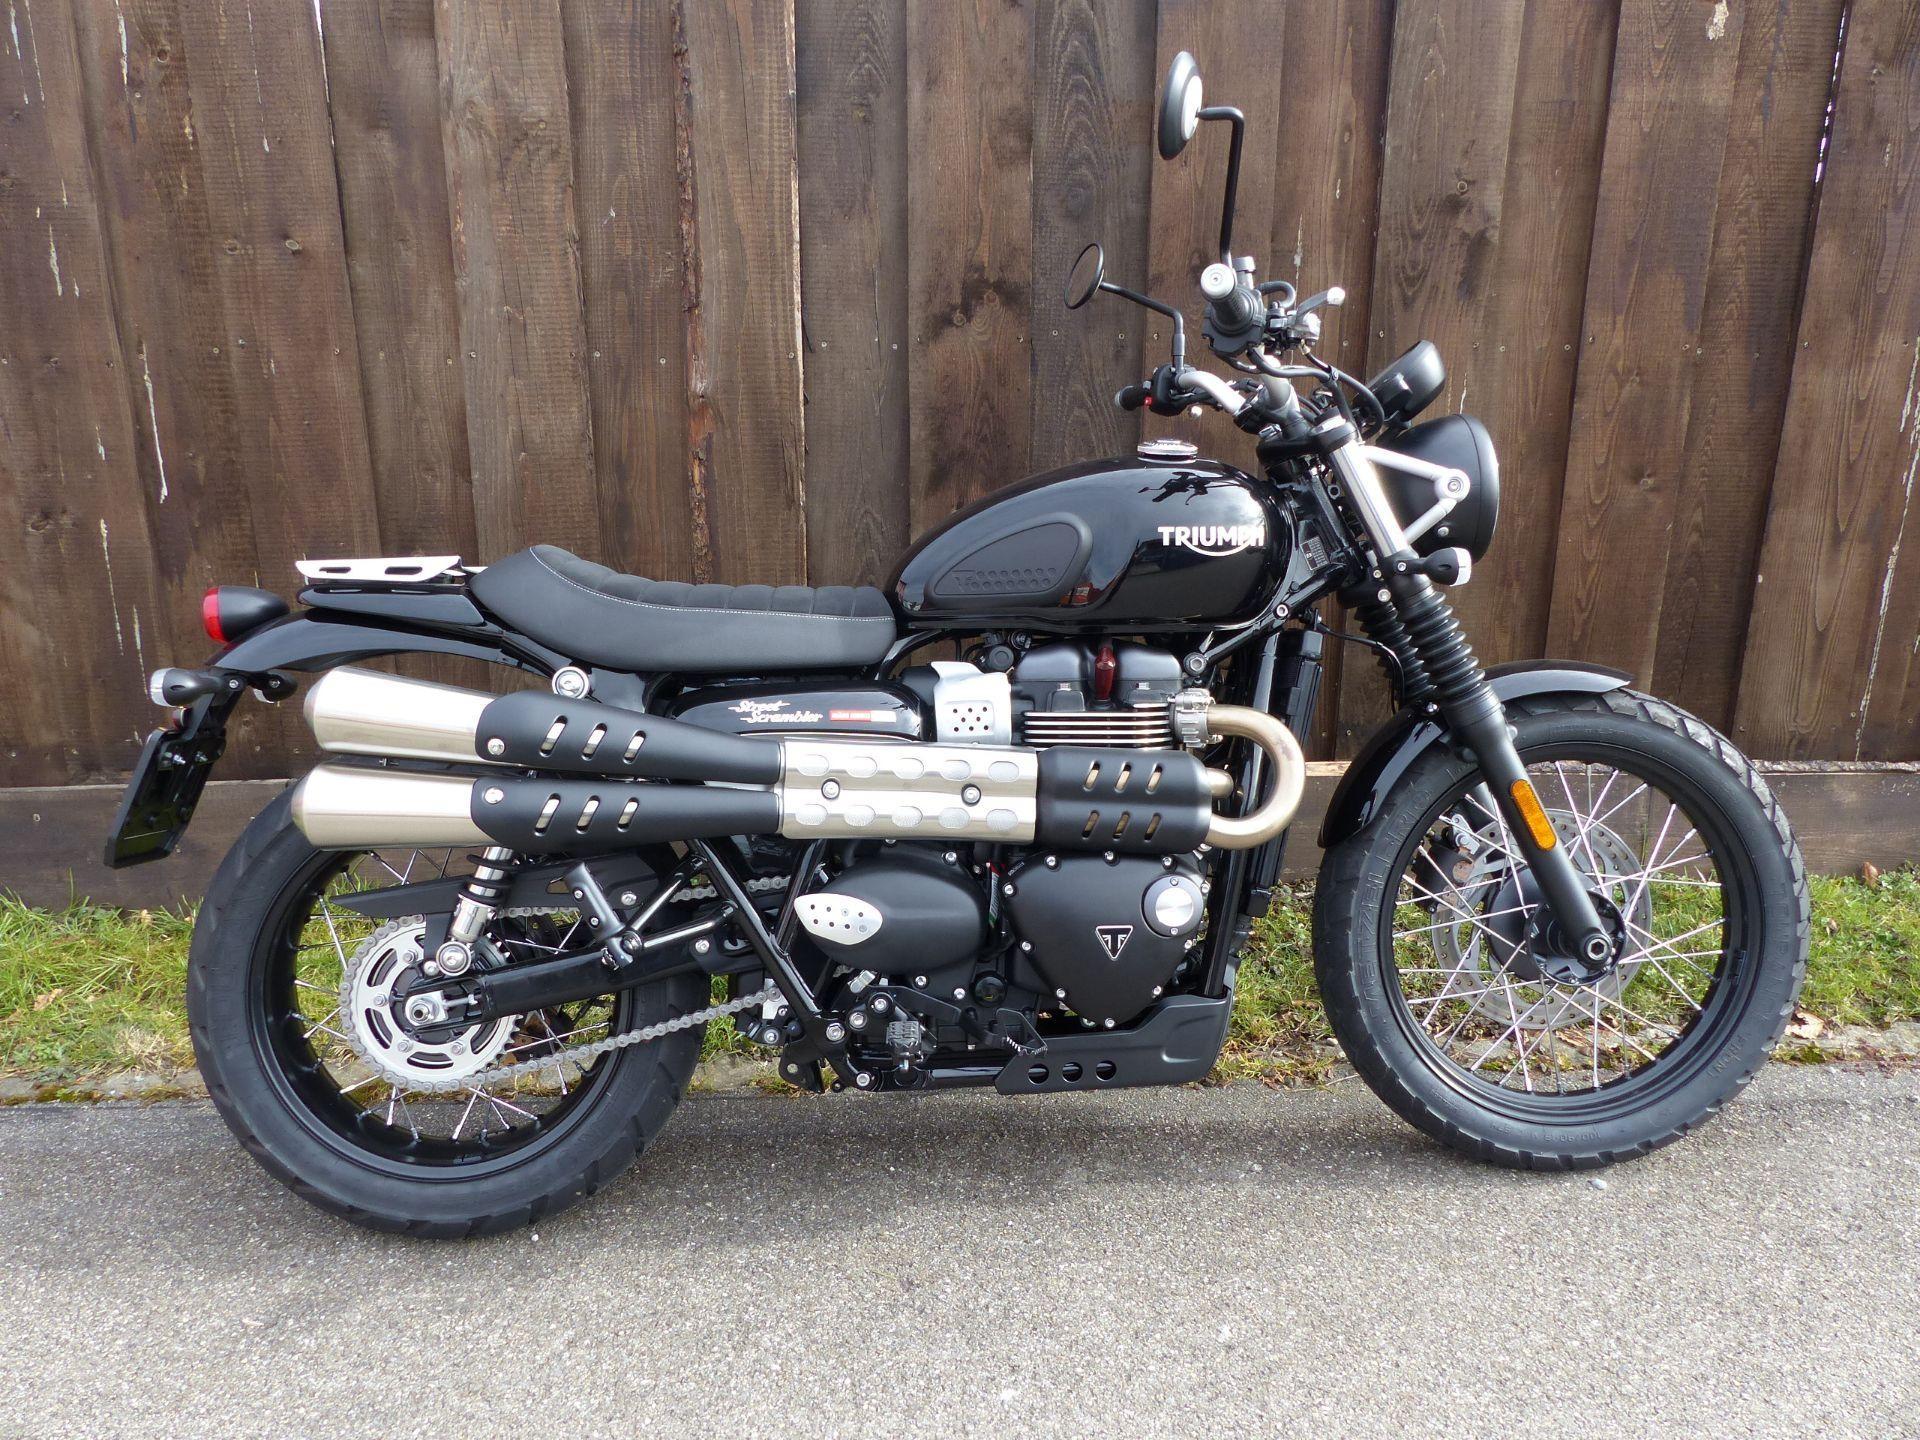 buy motorbike new vehicle bike triumph street scrambler 900 m ge motos gmbh frauenfeld id 4784344. Black Bedroom Furniture Sets. Home Design Ideas